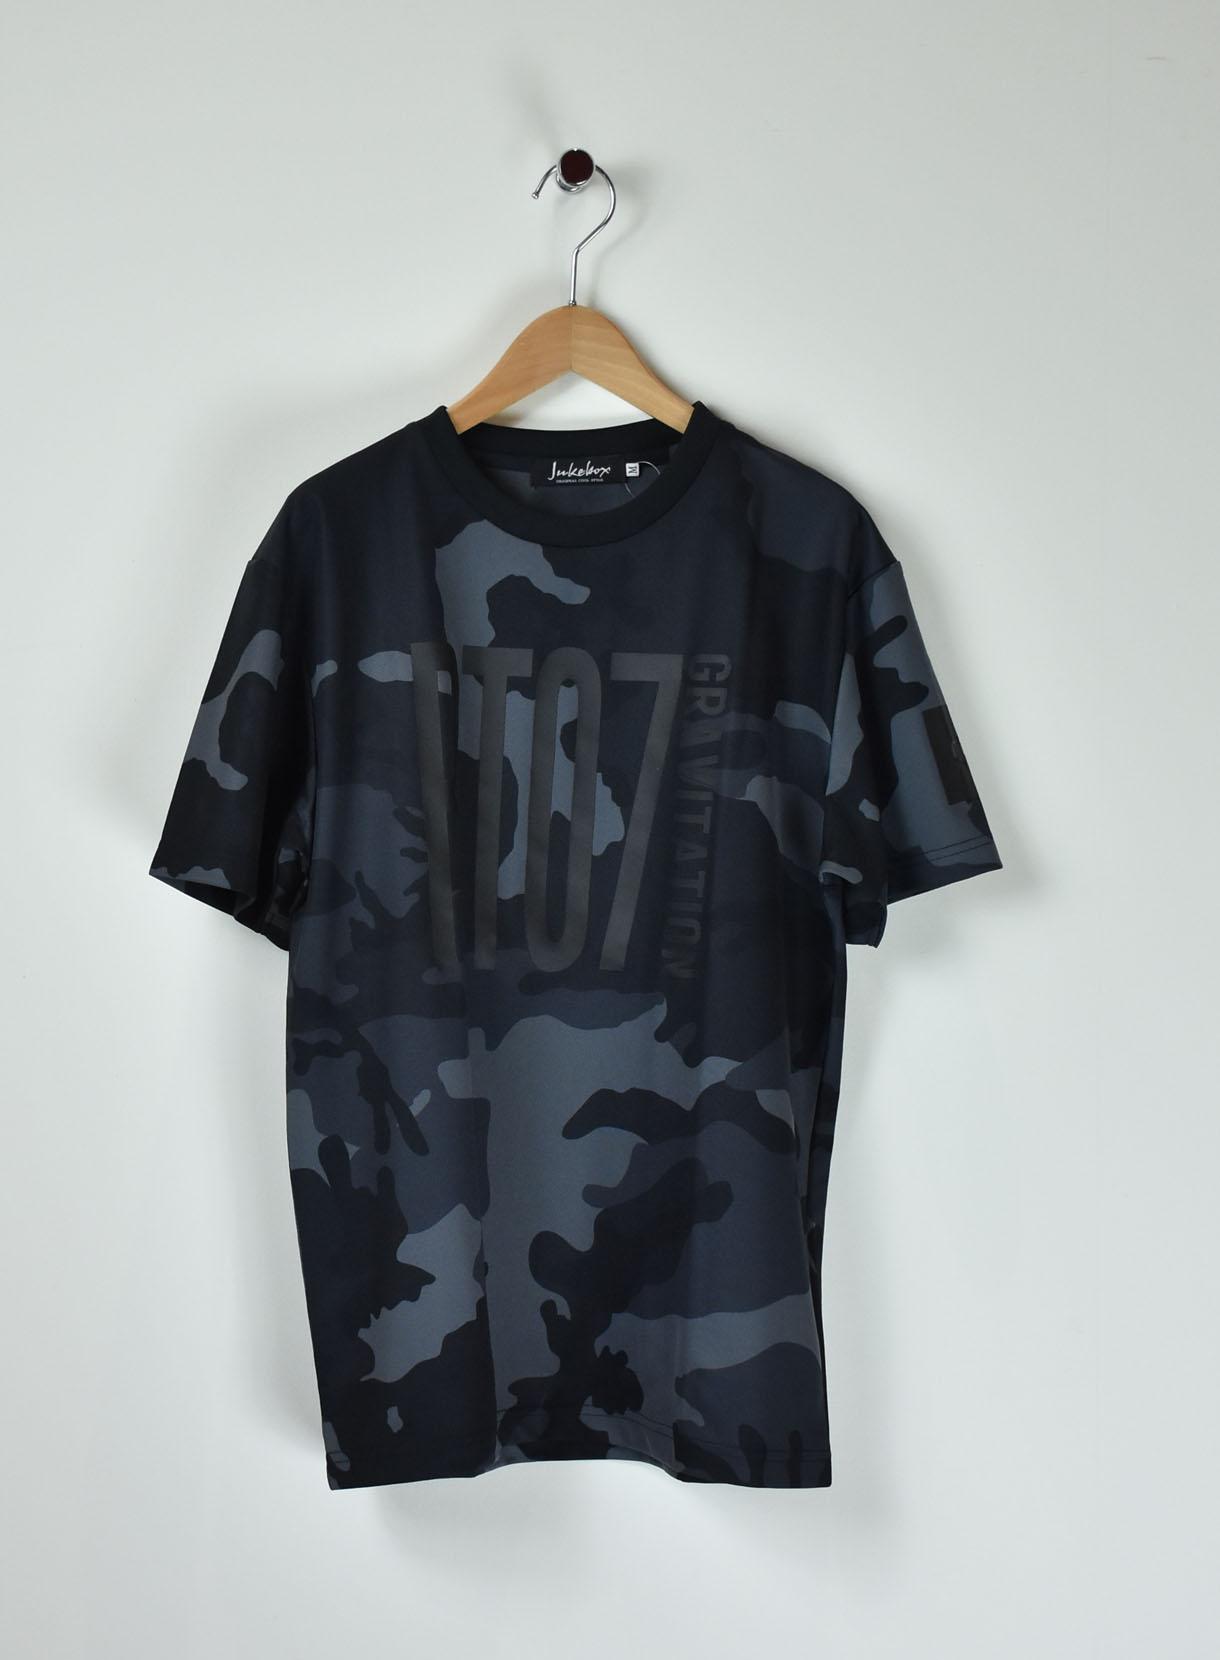 JUKEBOX ドライアスレチックカモフラTシャツ